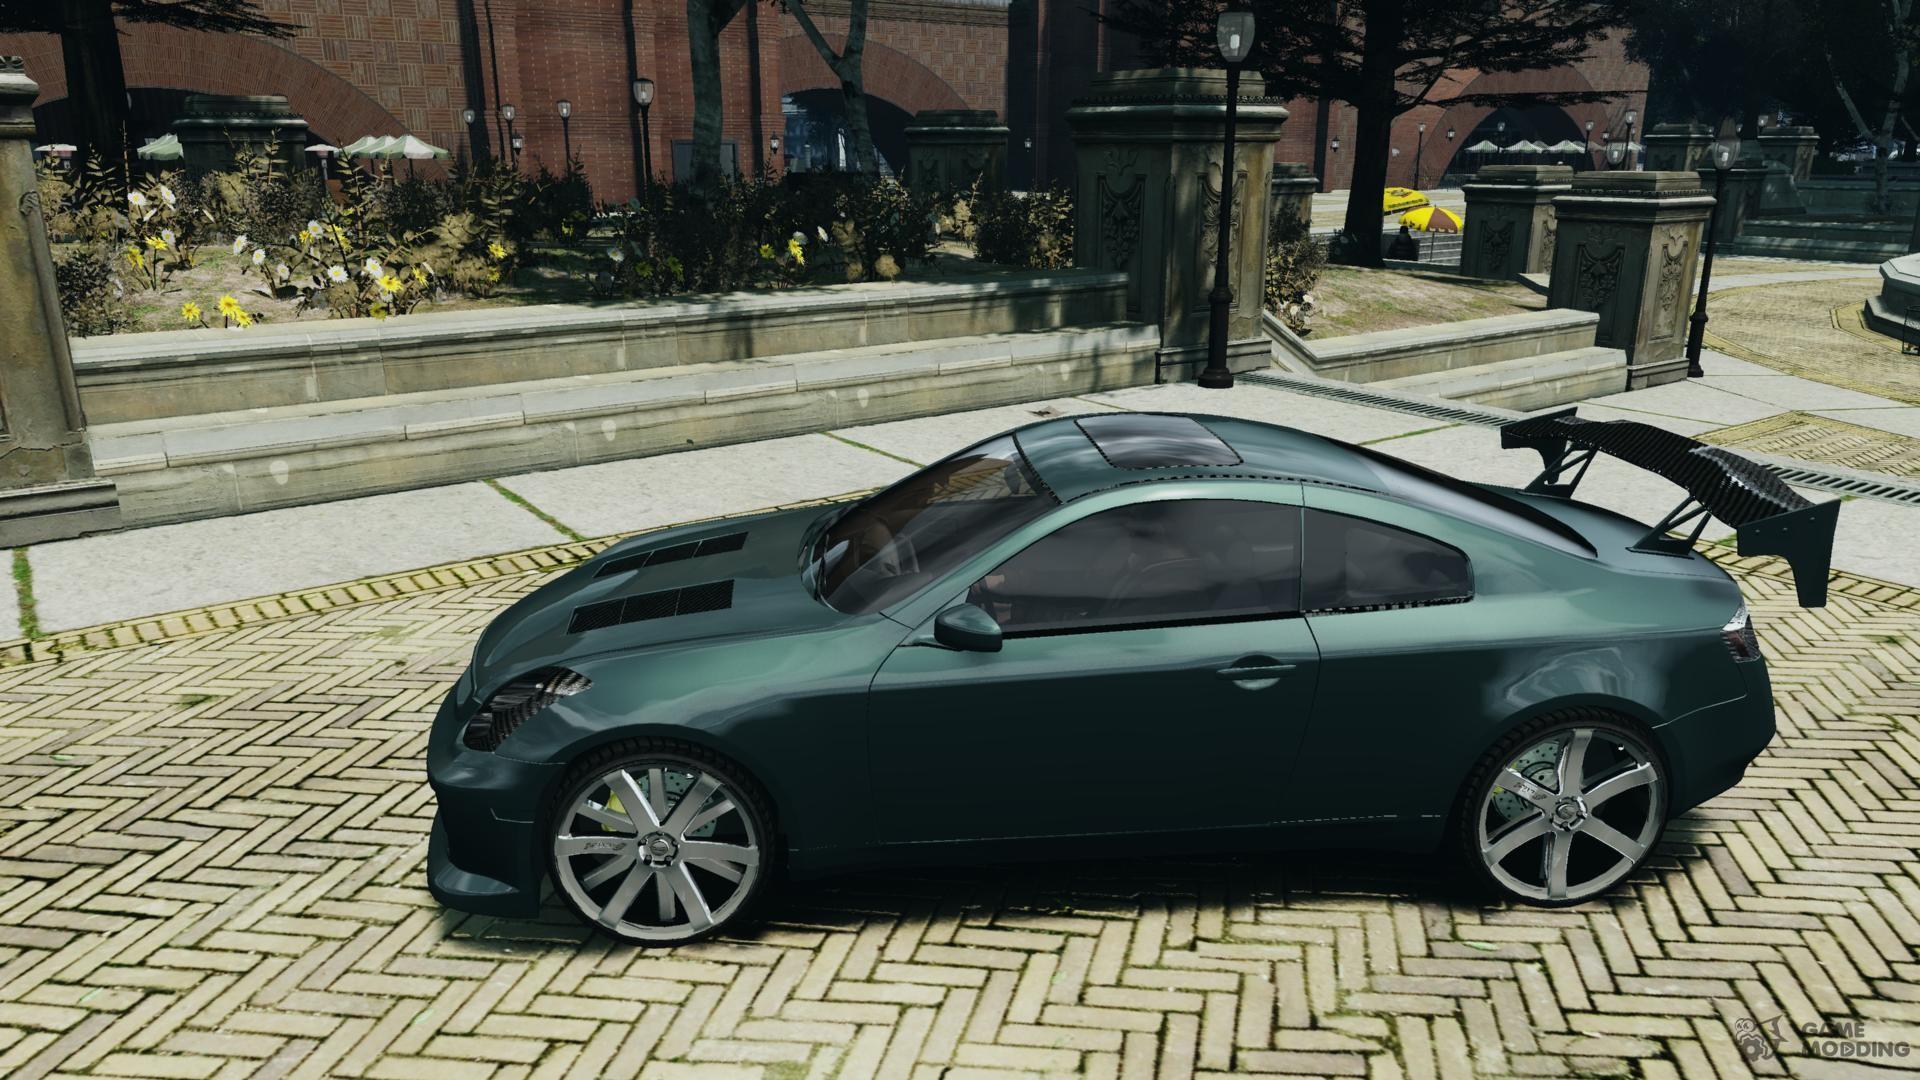 Infiniti g35 coupe tunning for gta 4 infiniti g35 coupe tunning for gta 4 left view vanachro Image collections